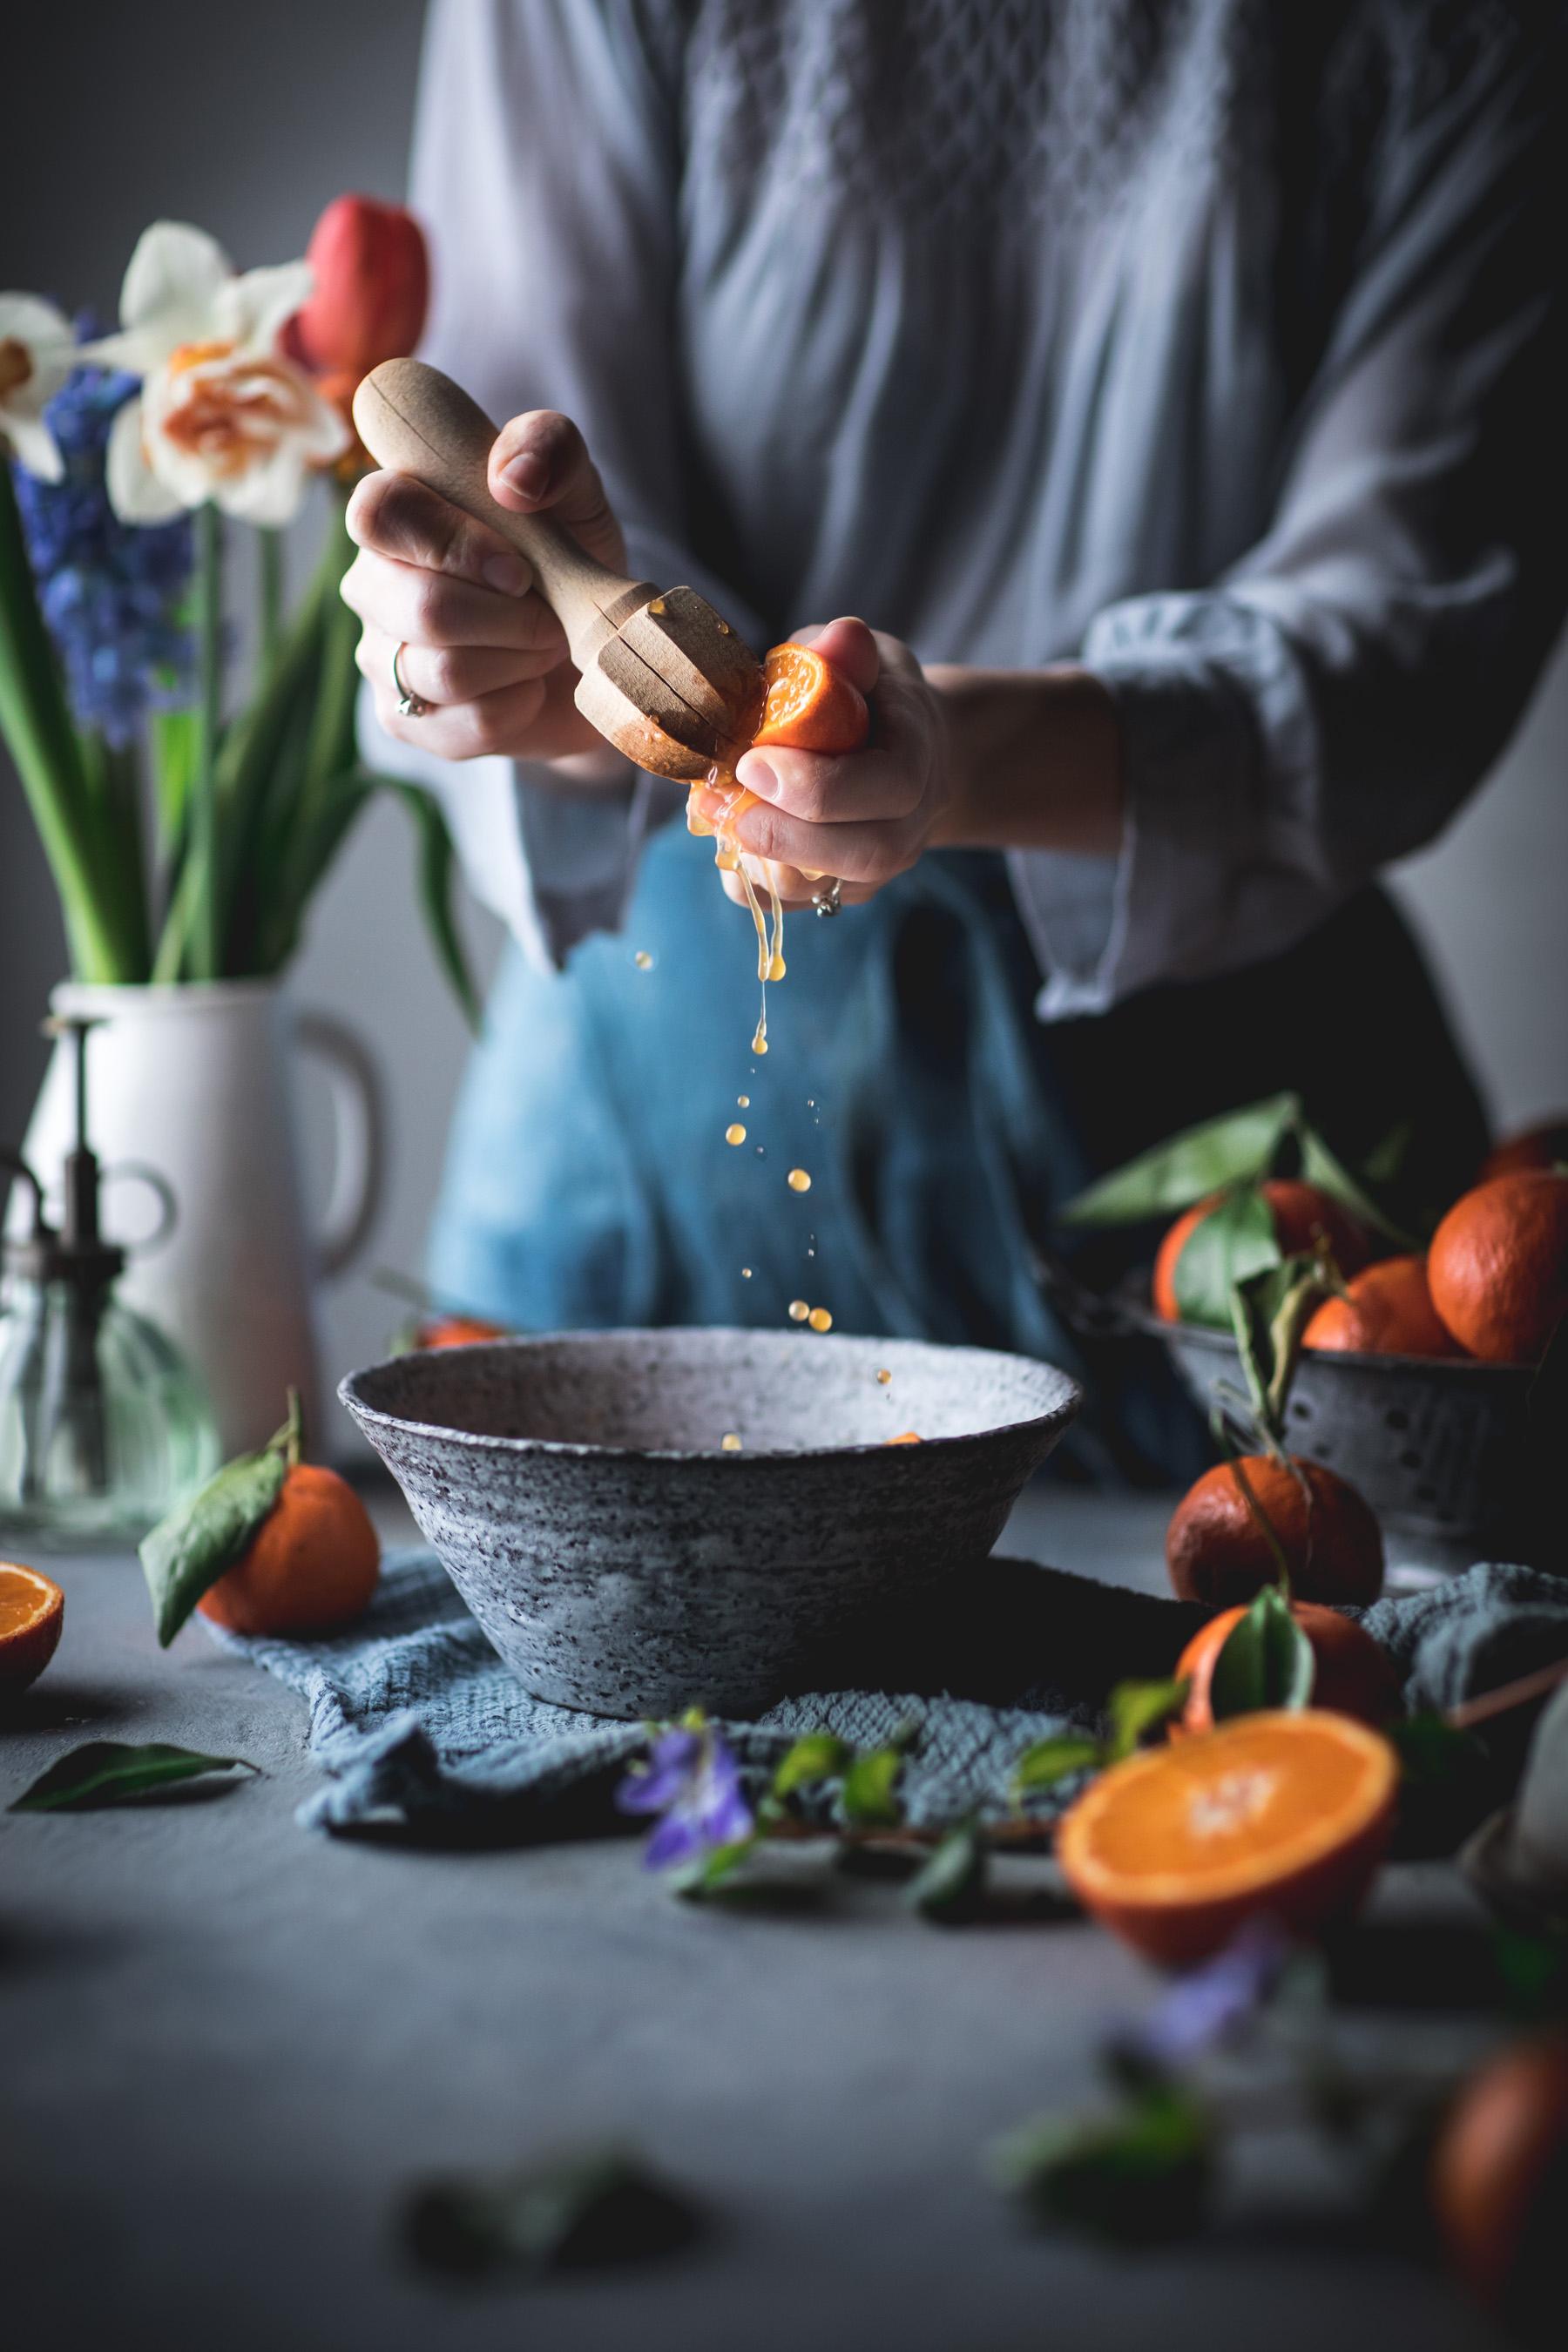 Tangerine Juicing